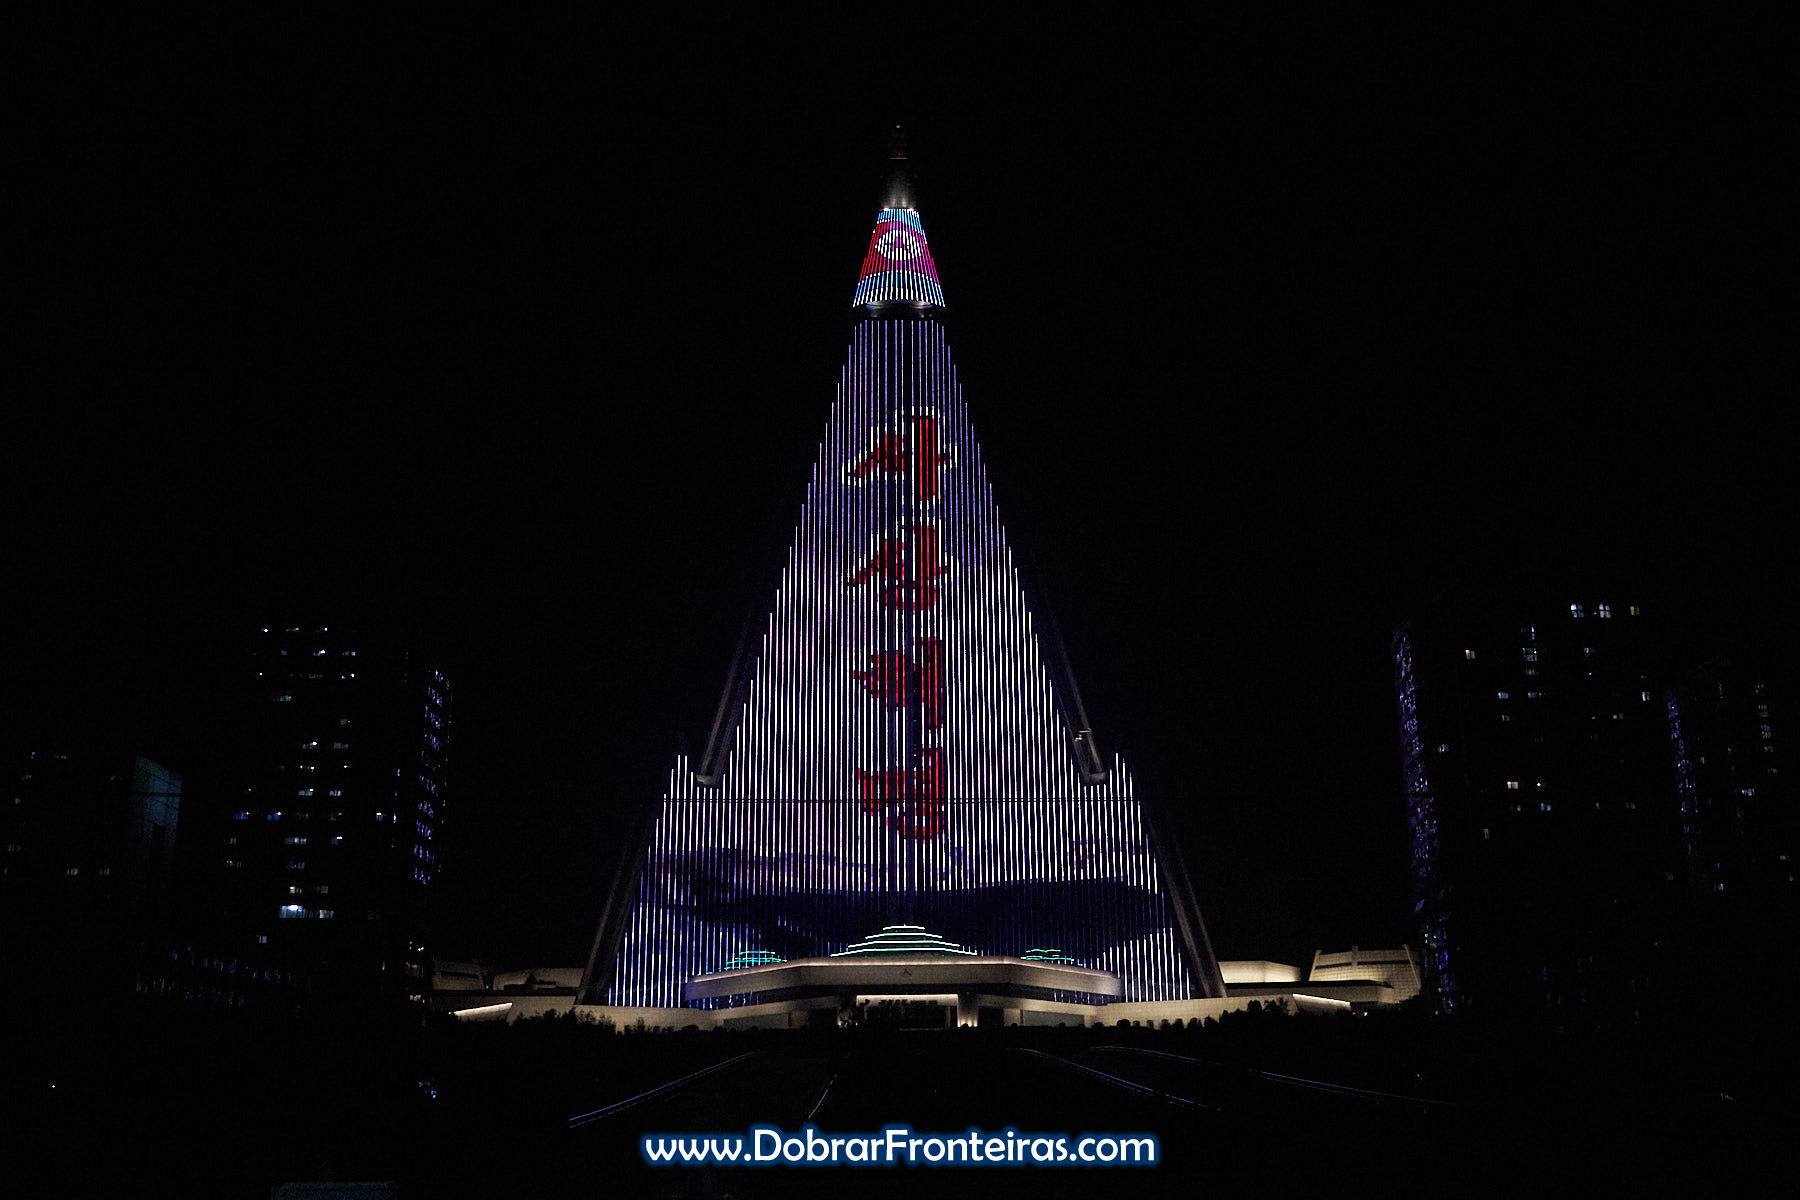 Hotel Ryugyong à noite iluminado